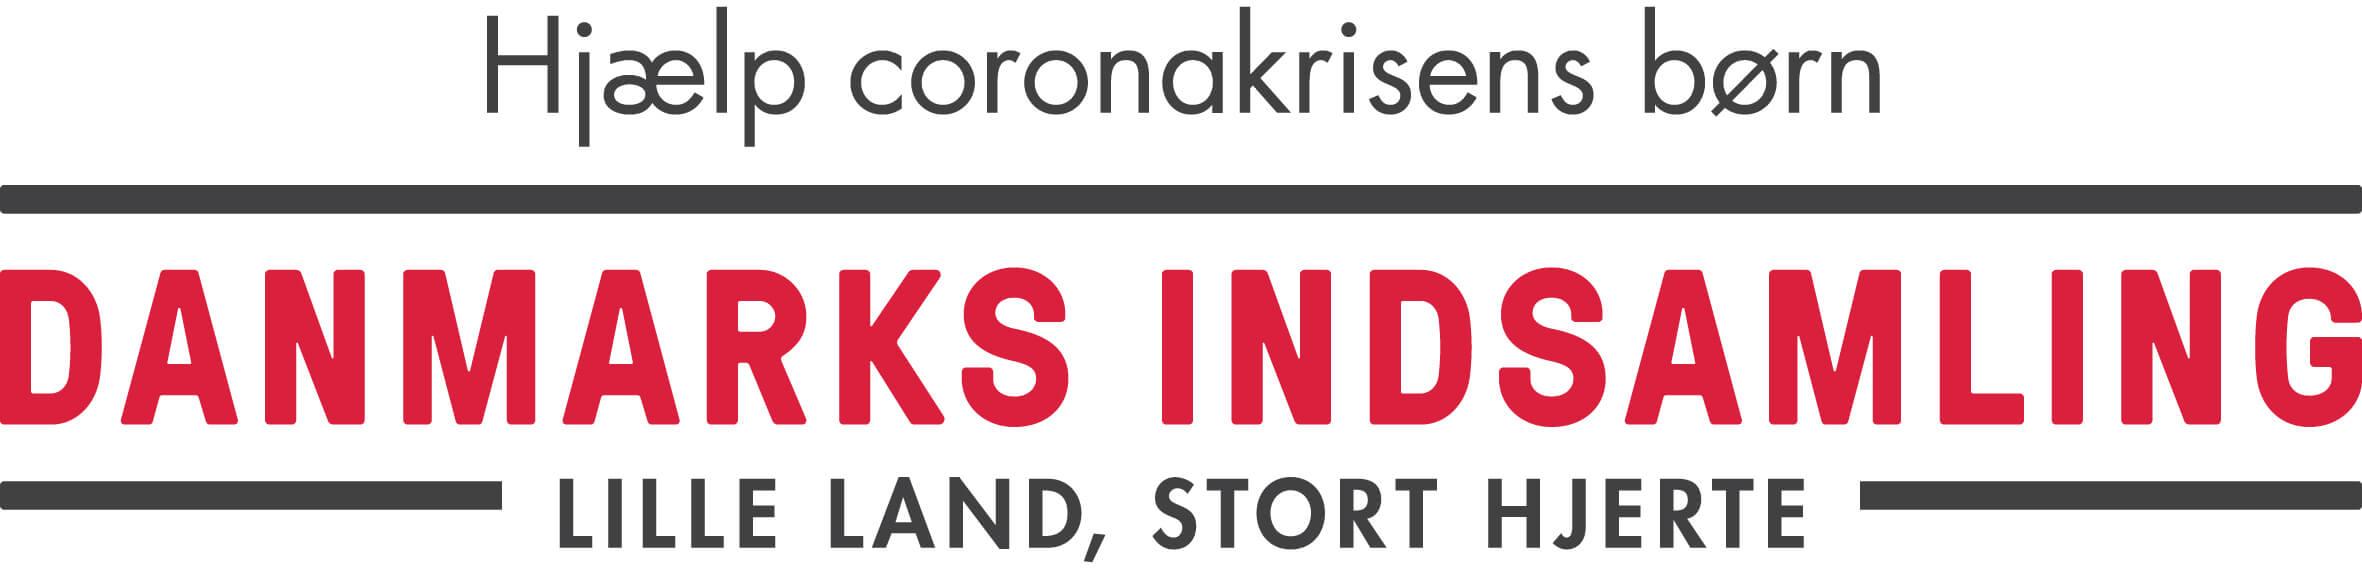 Danmarks Indsamling coronakrisens børn